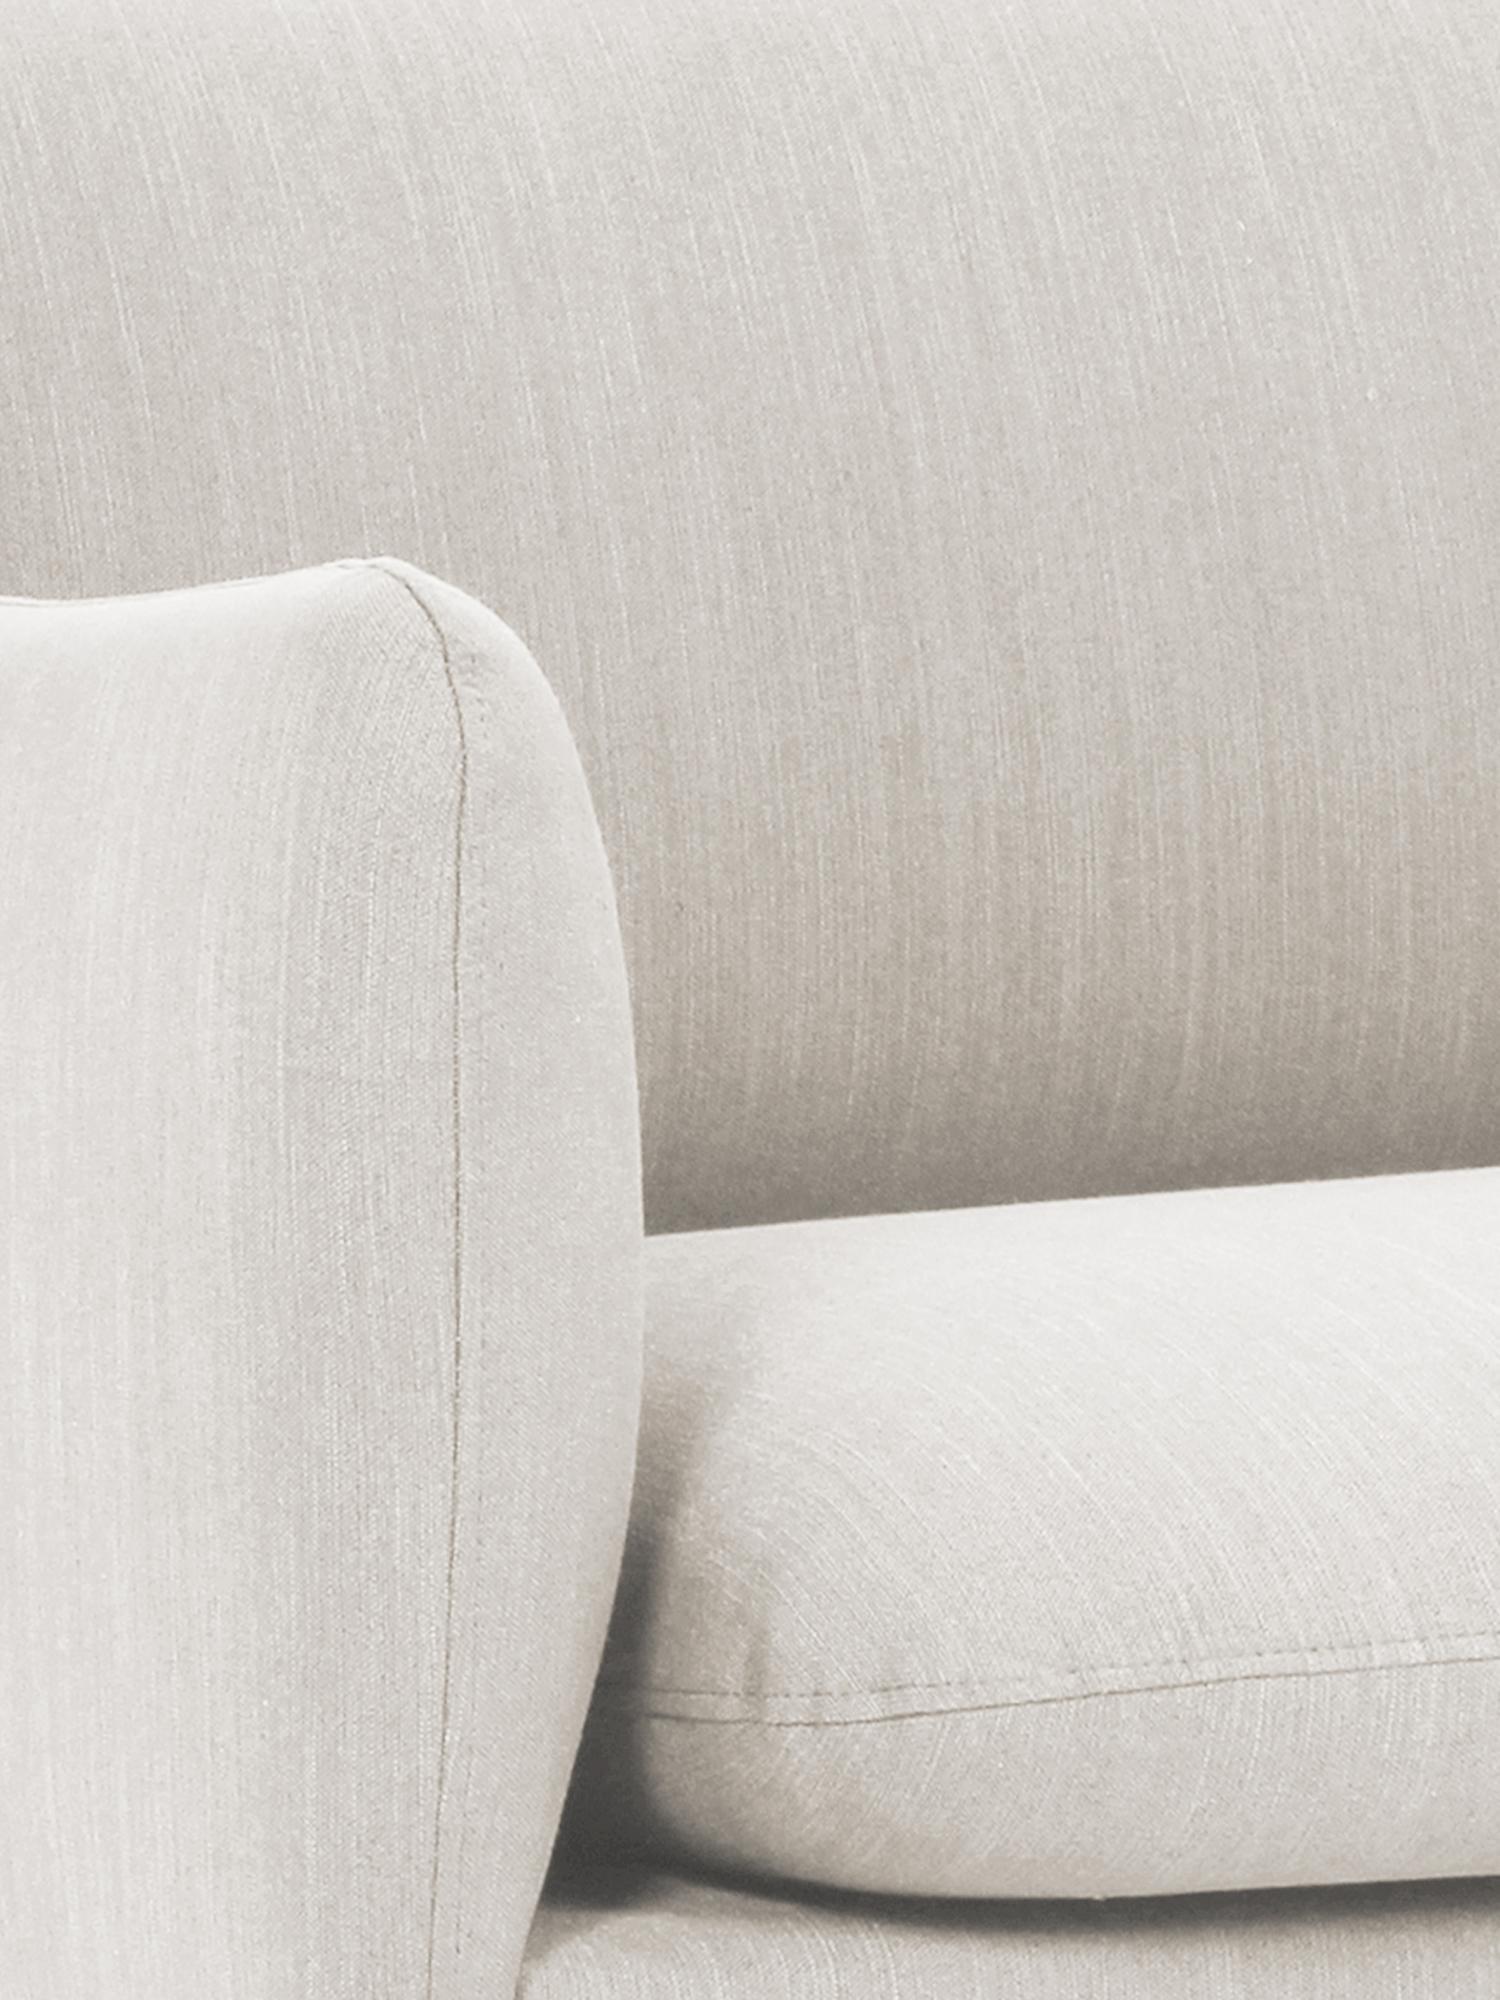 Sofa Moby (3-Sitzer), Bezug: Polyester Der hochwertige, Gestell: Massives Kiefernholz, Webstoff Beige, B 220 x T 95 cm